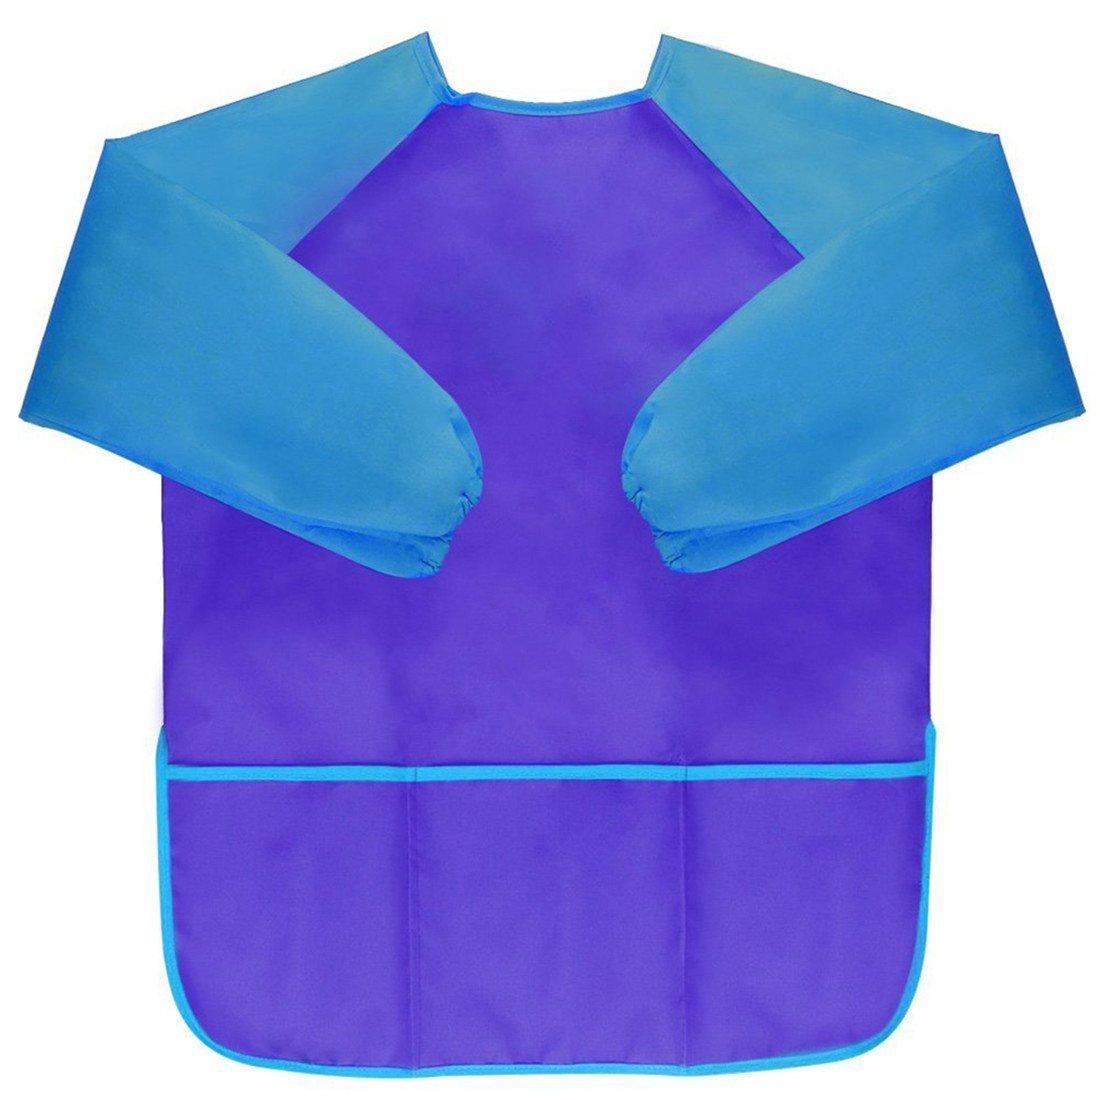 VWH Children Waterproof Artist Painting Smock Aprons Long Sleeve Blue for 5-8 Years